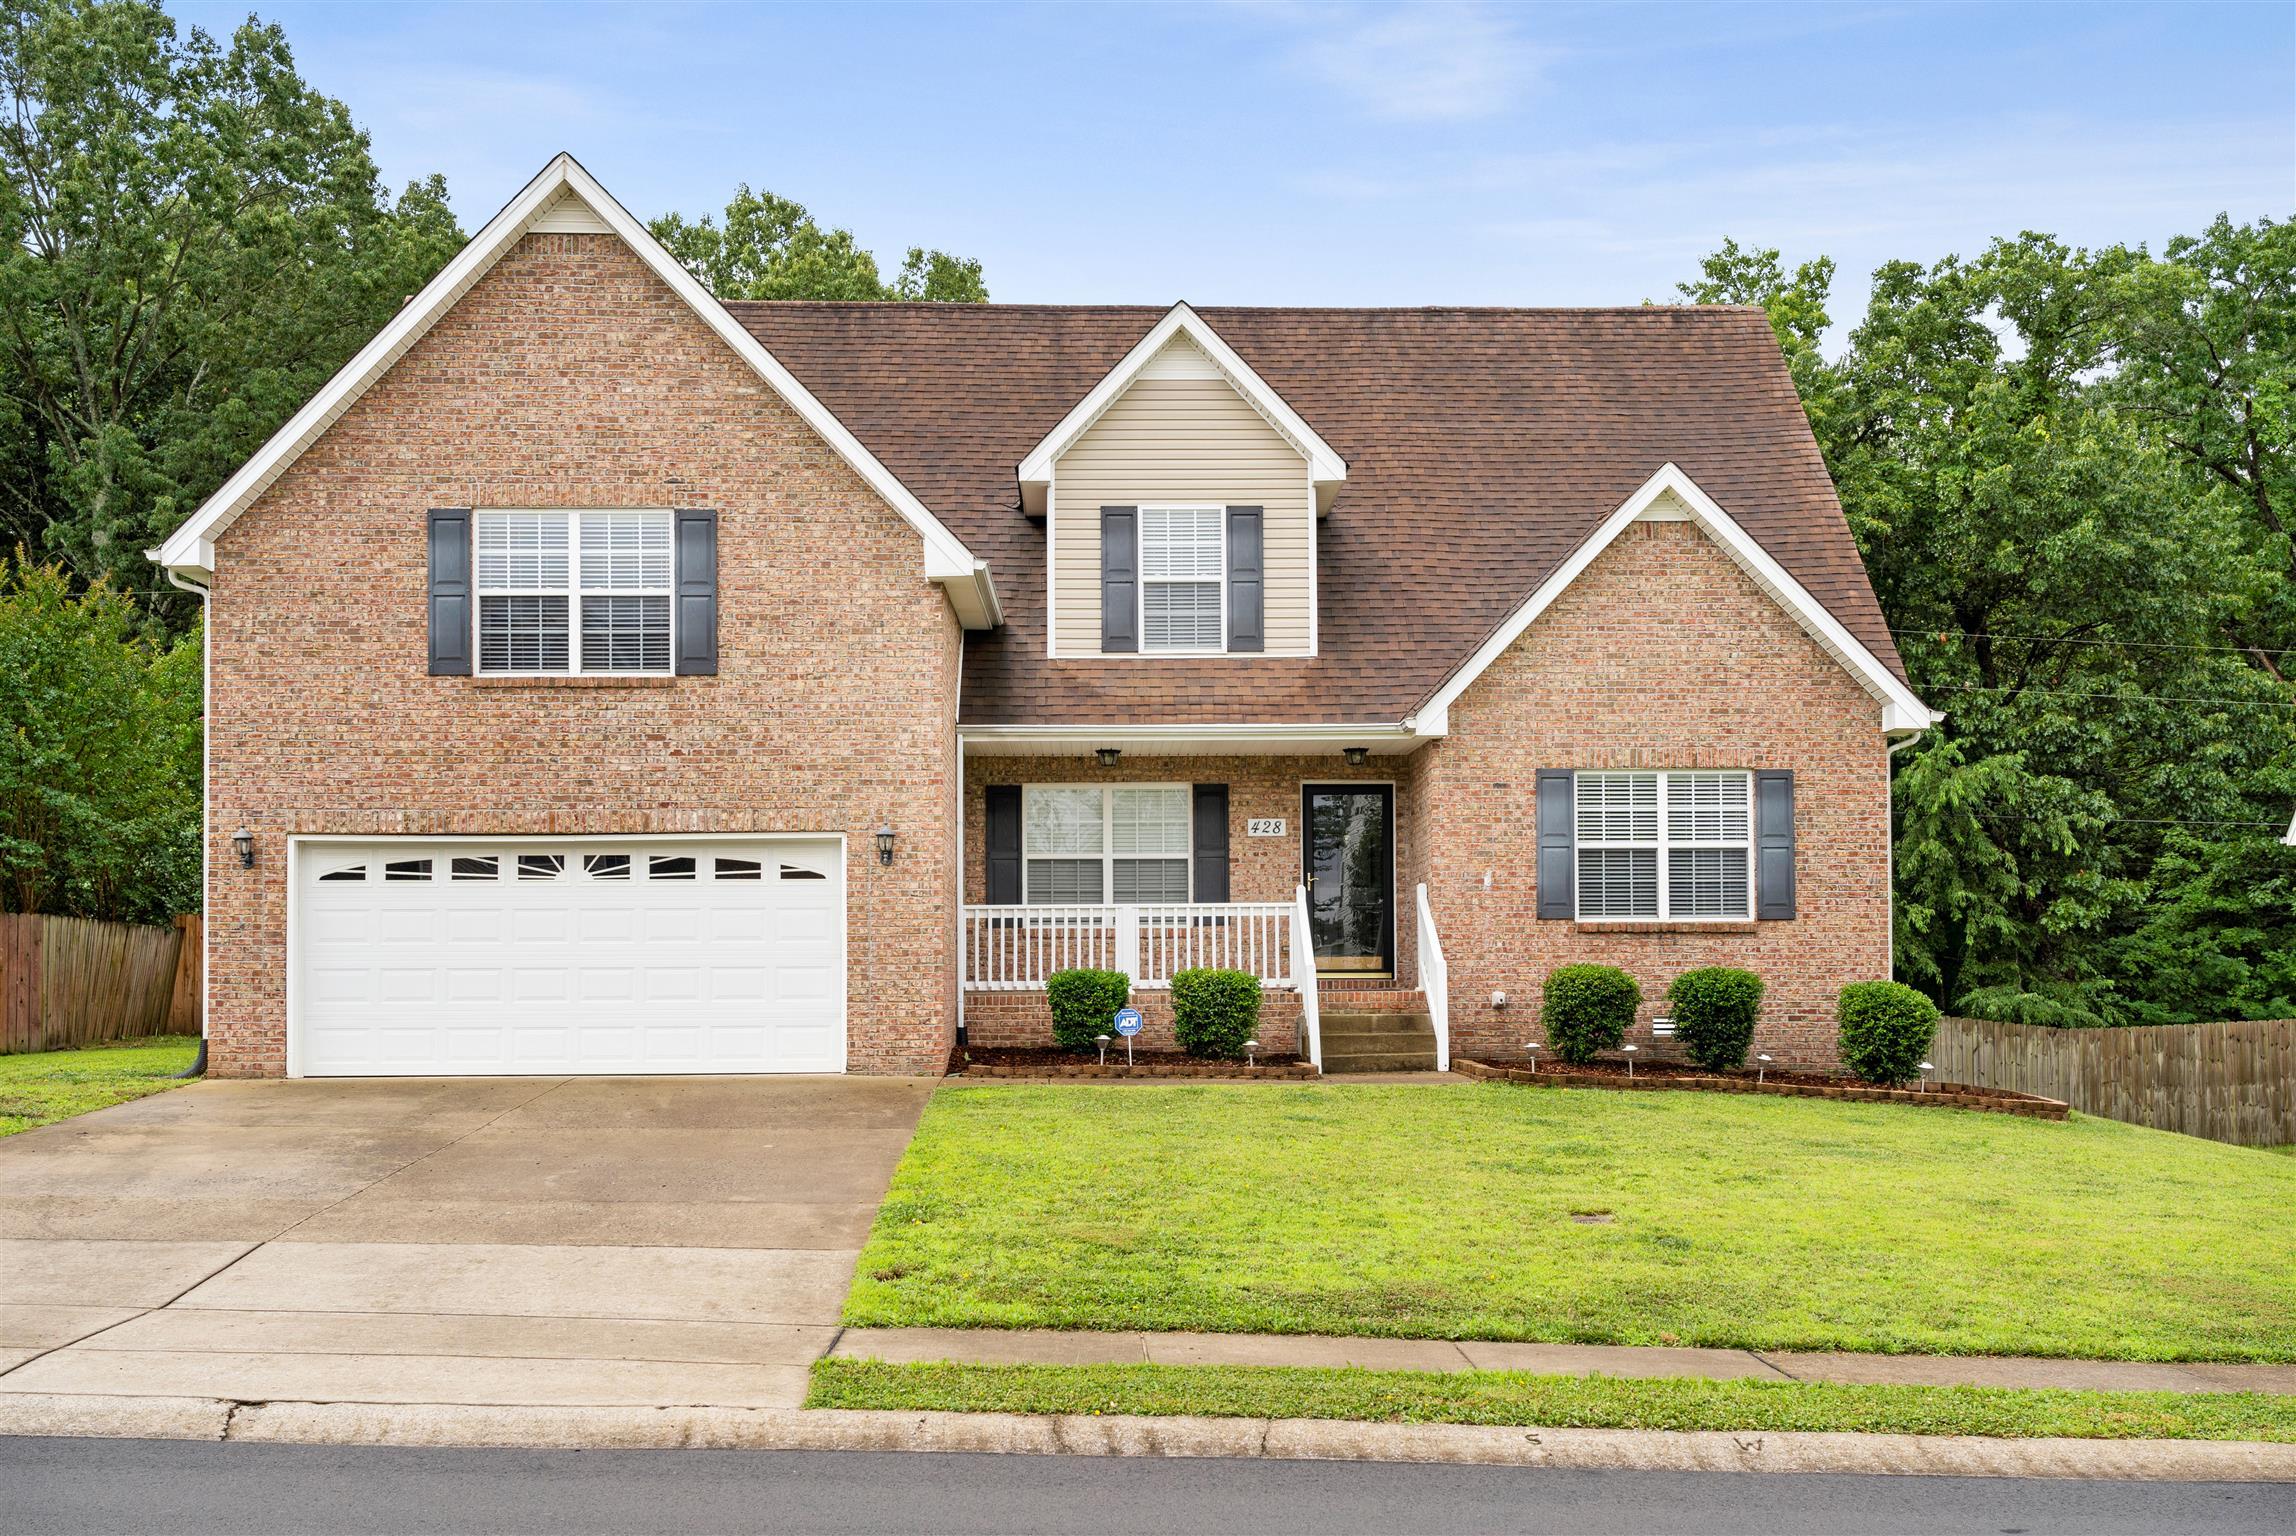 428 Winding Bluff Way, Clarksville, TN 37040 - Clarksville, TN real estate listing